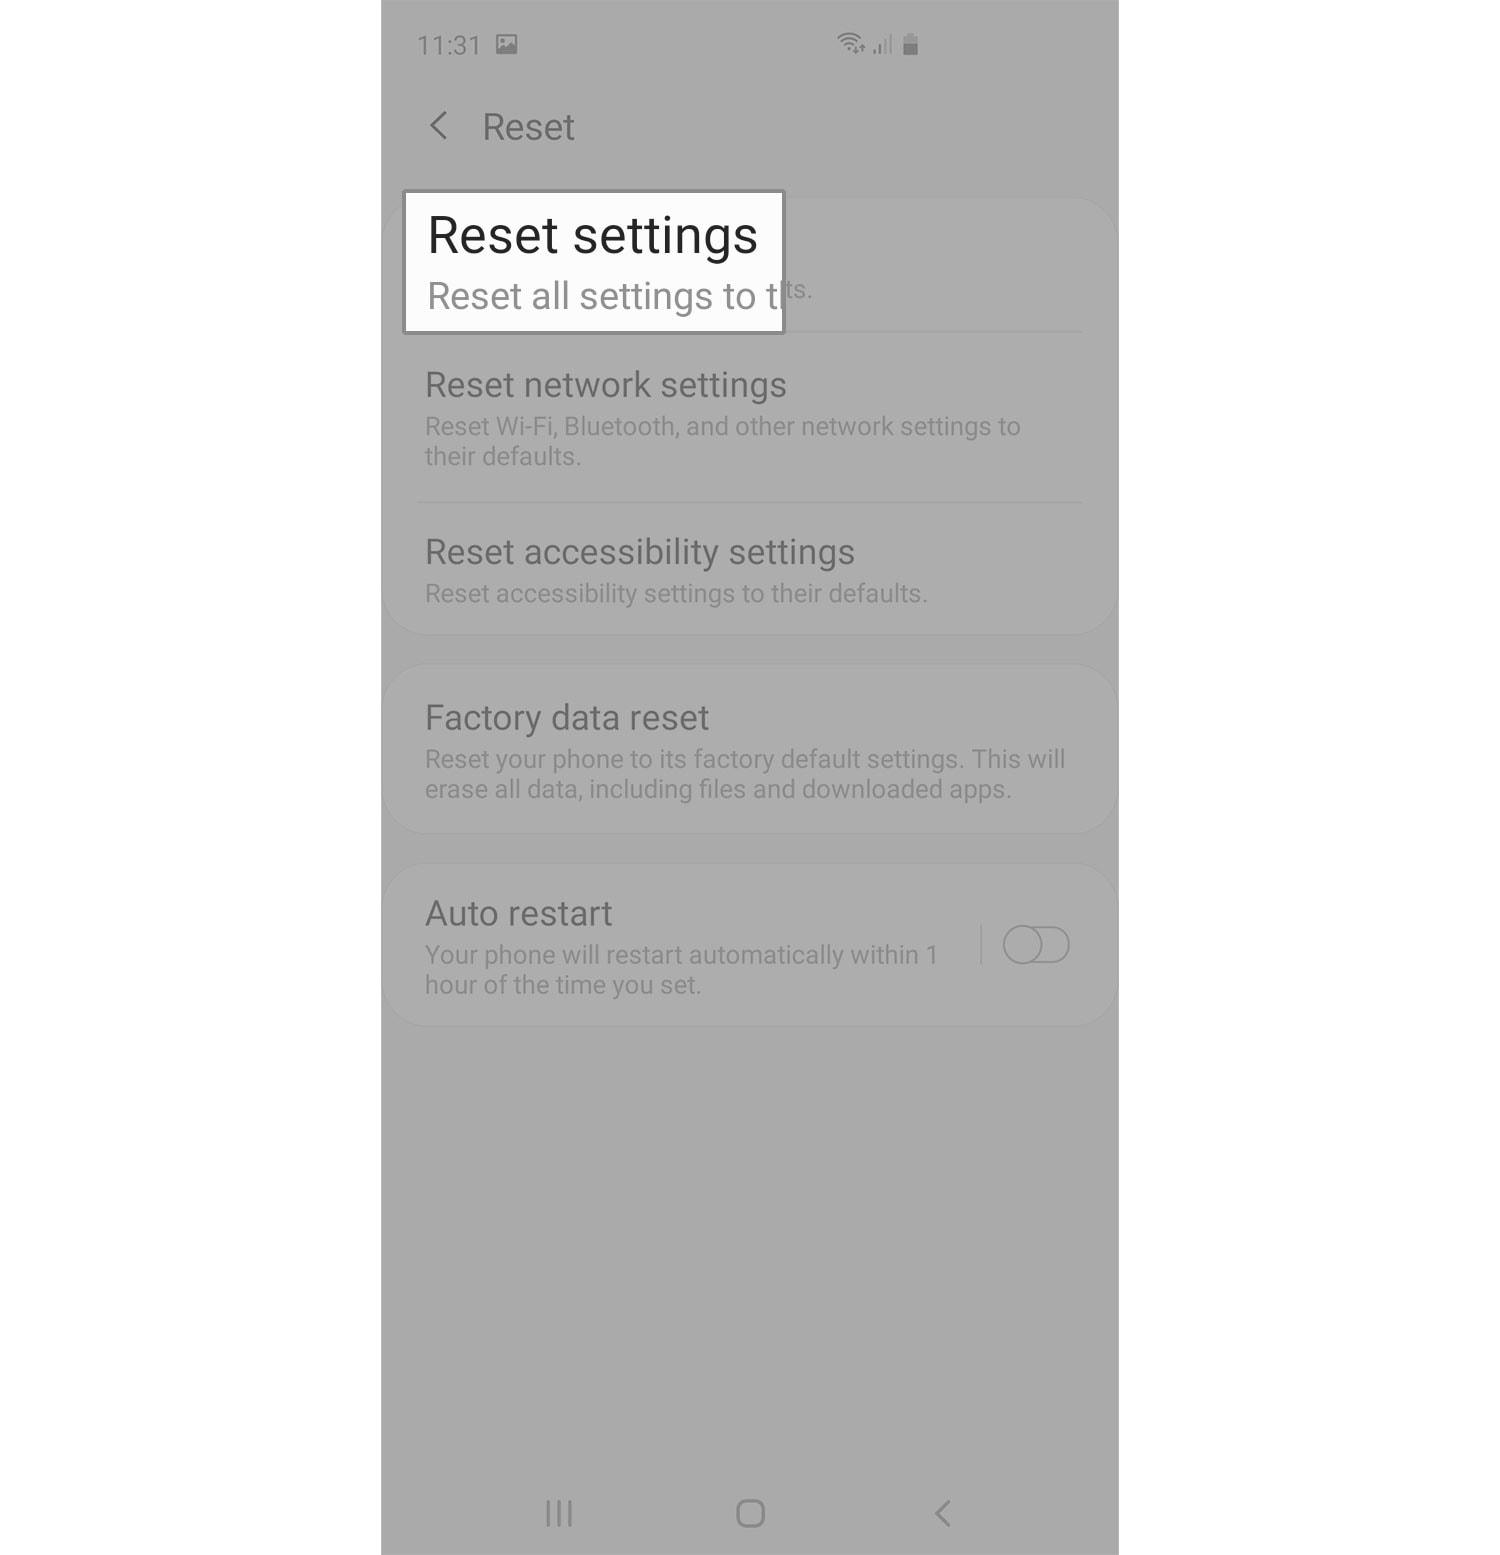 reset galaxy s20 settings reset settings option